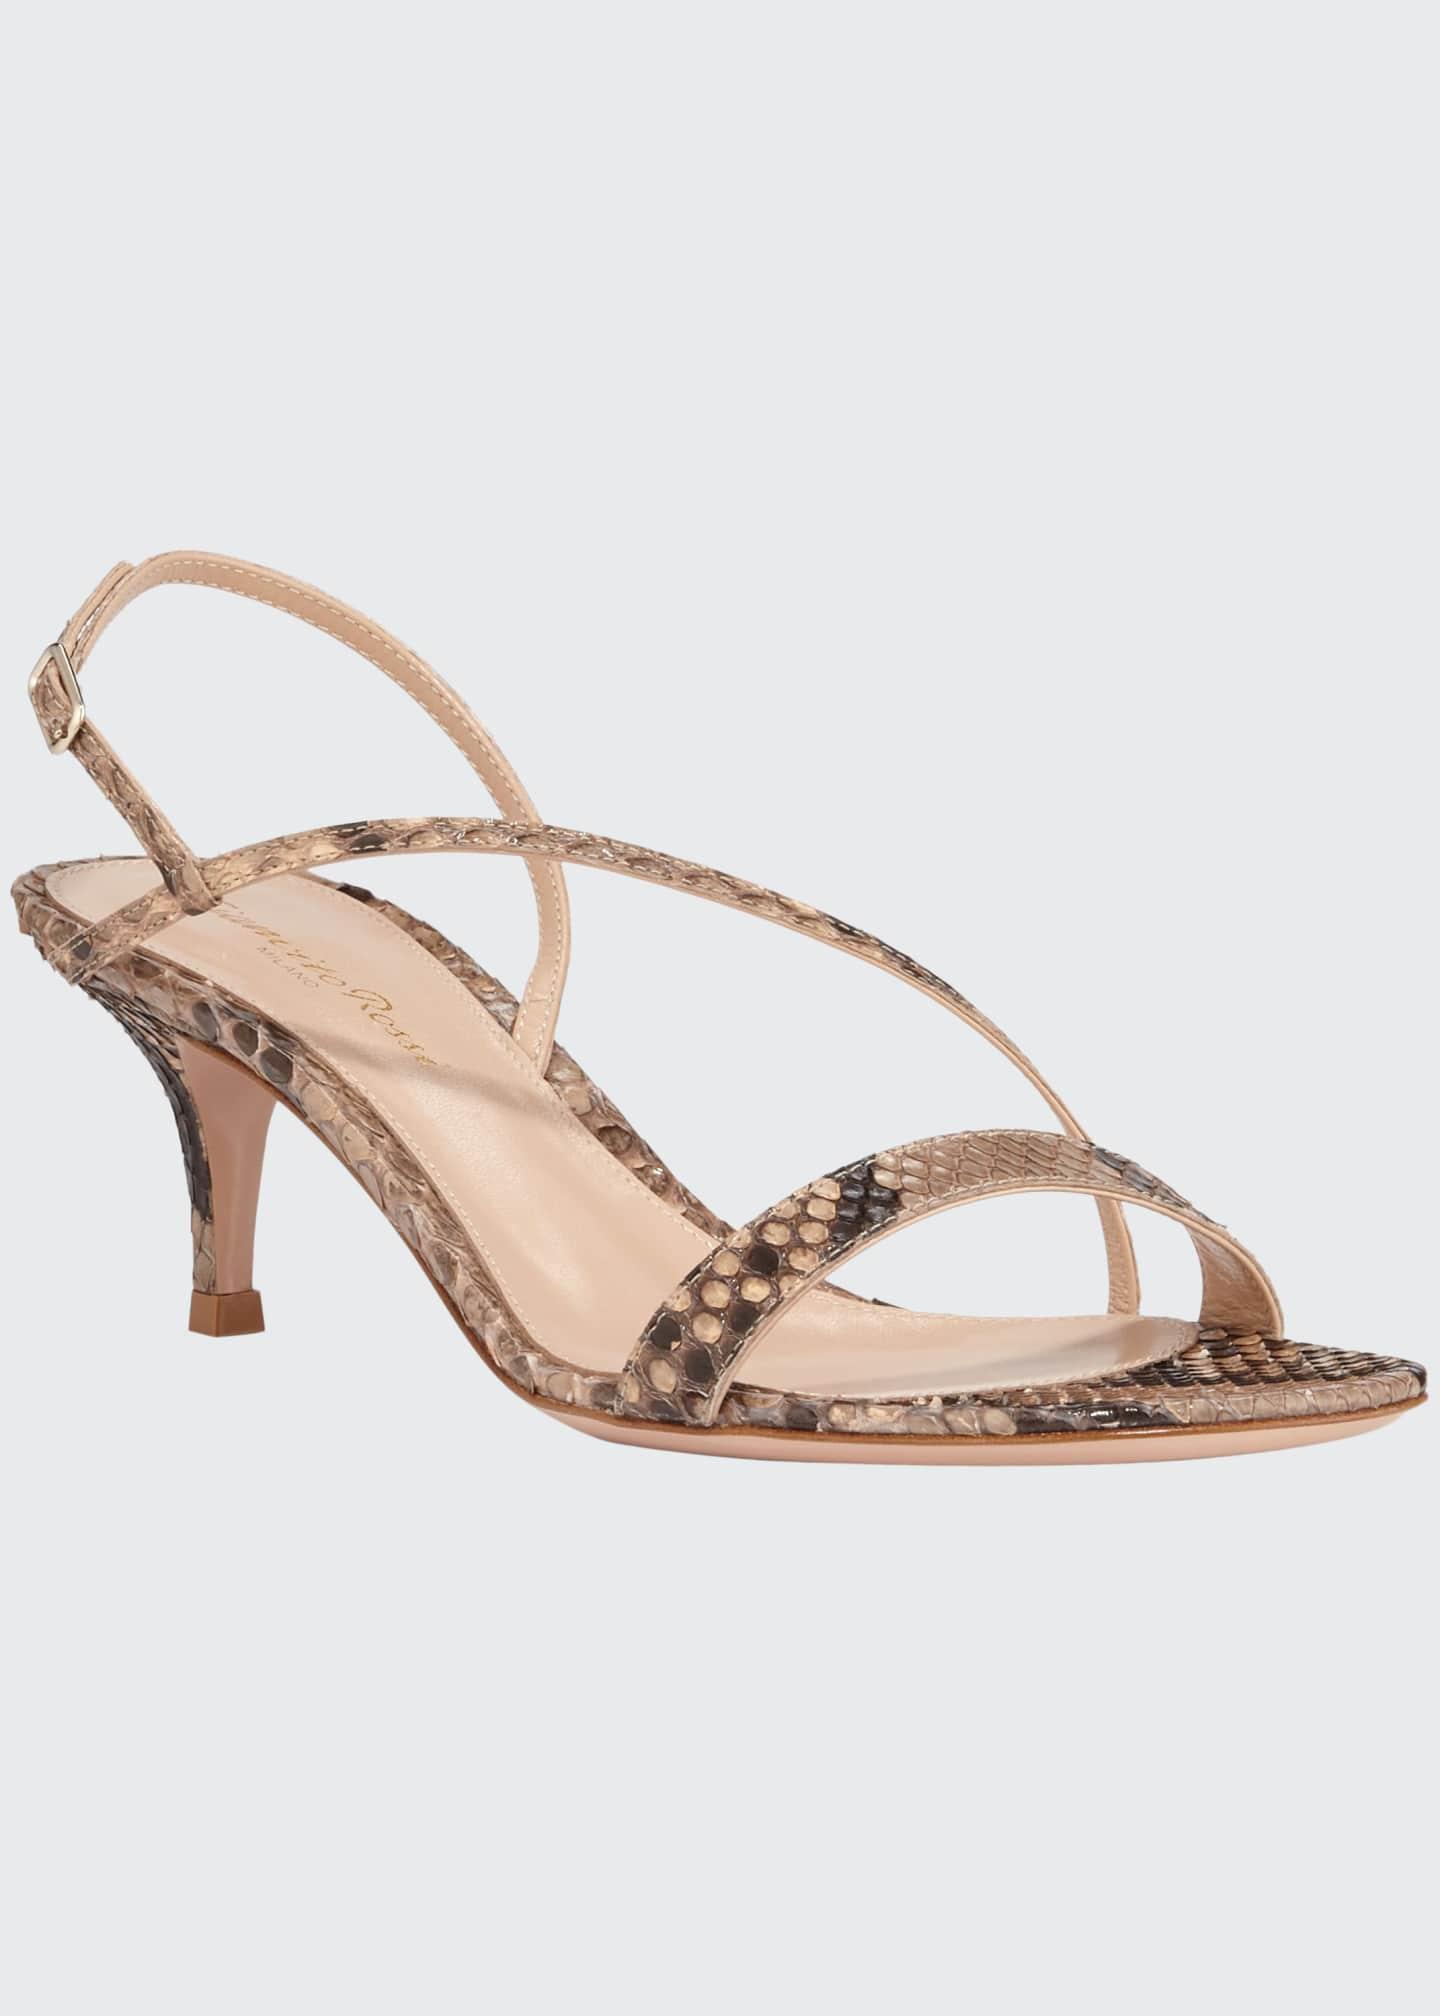 Gianvito Rossi Python Asymmetric Slingback Sandals